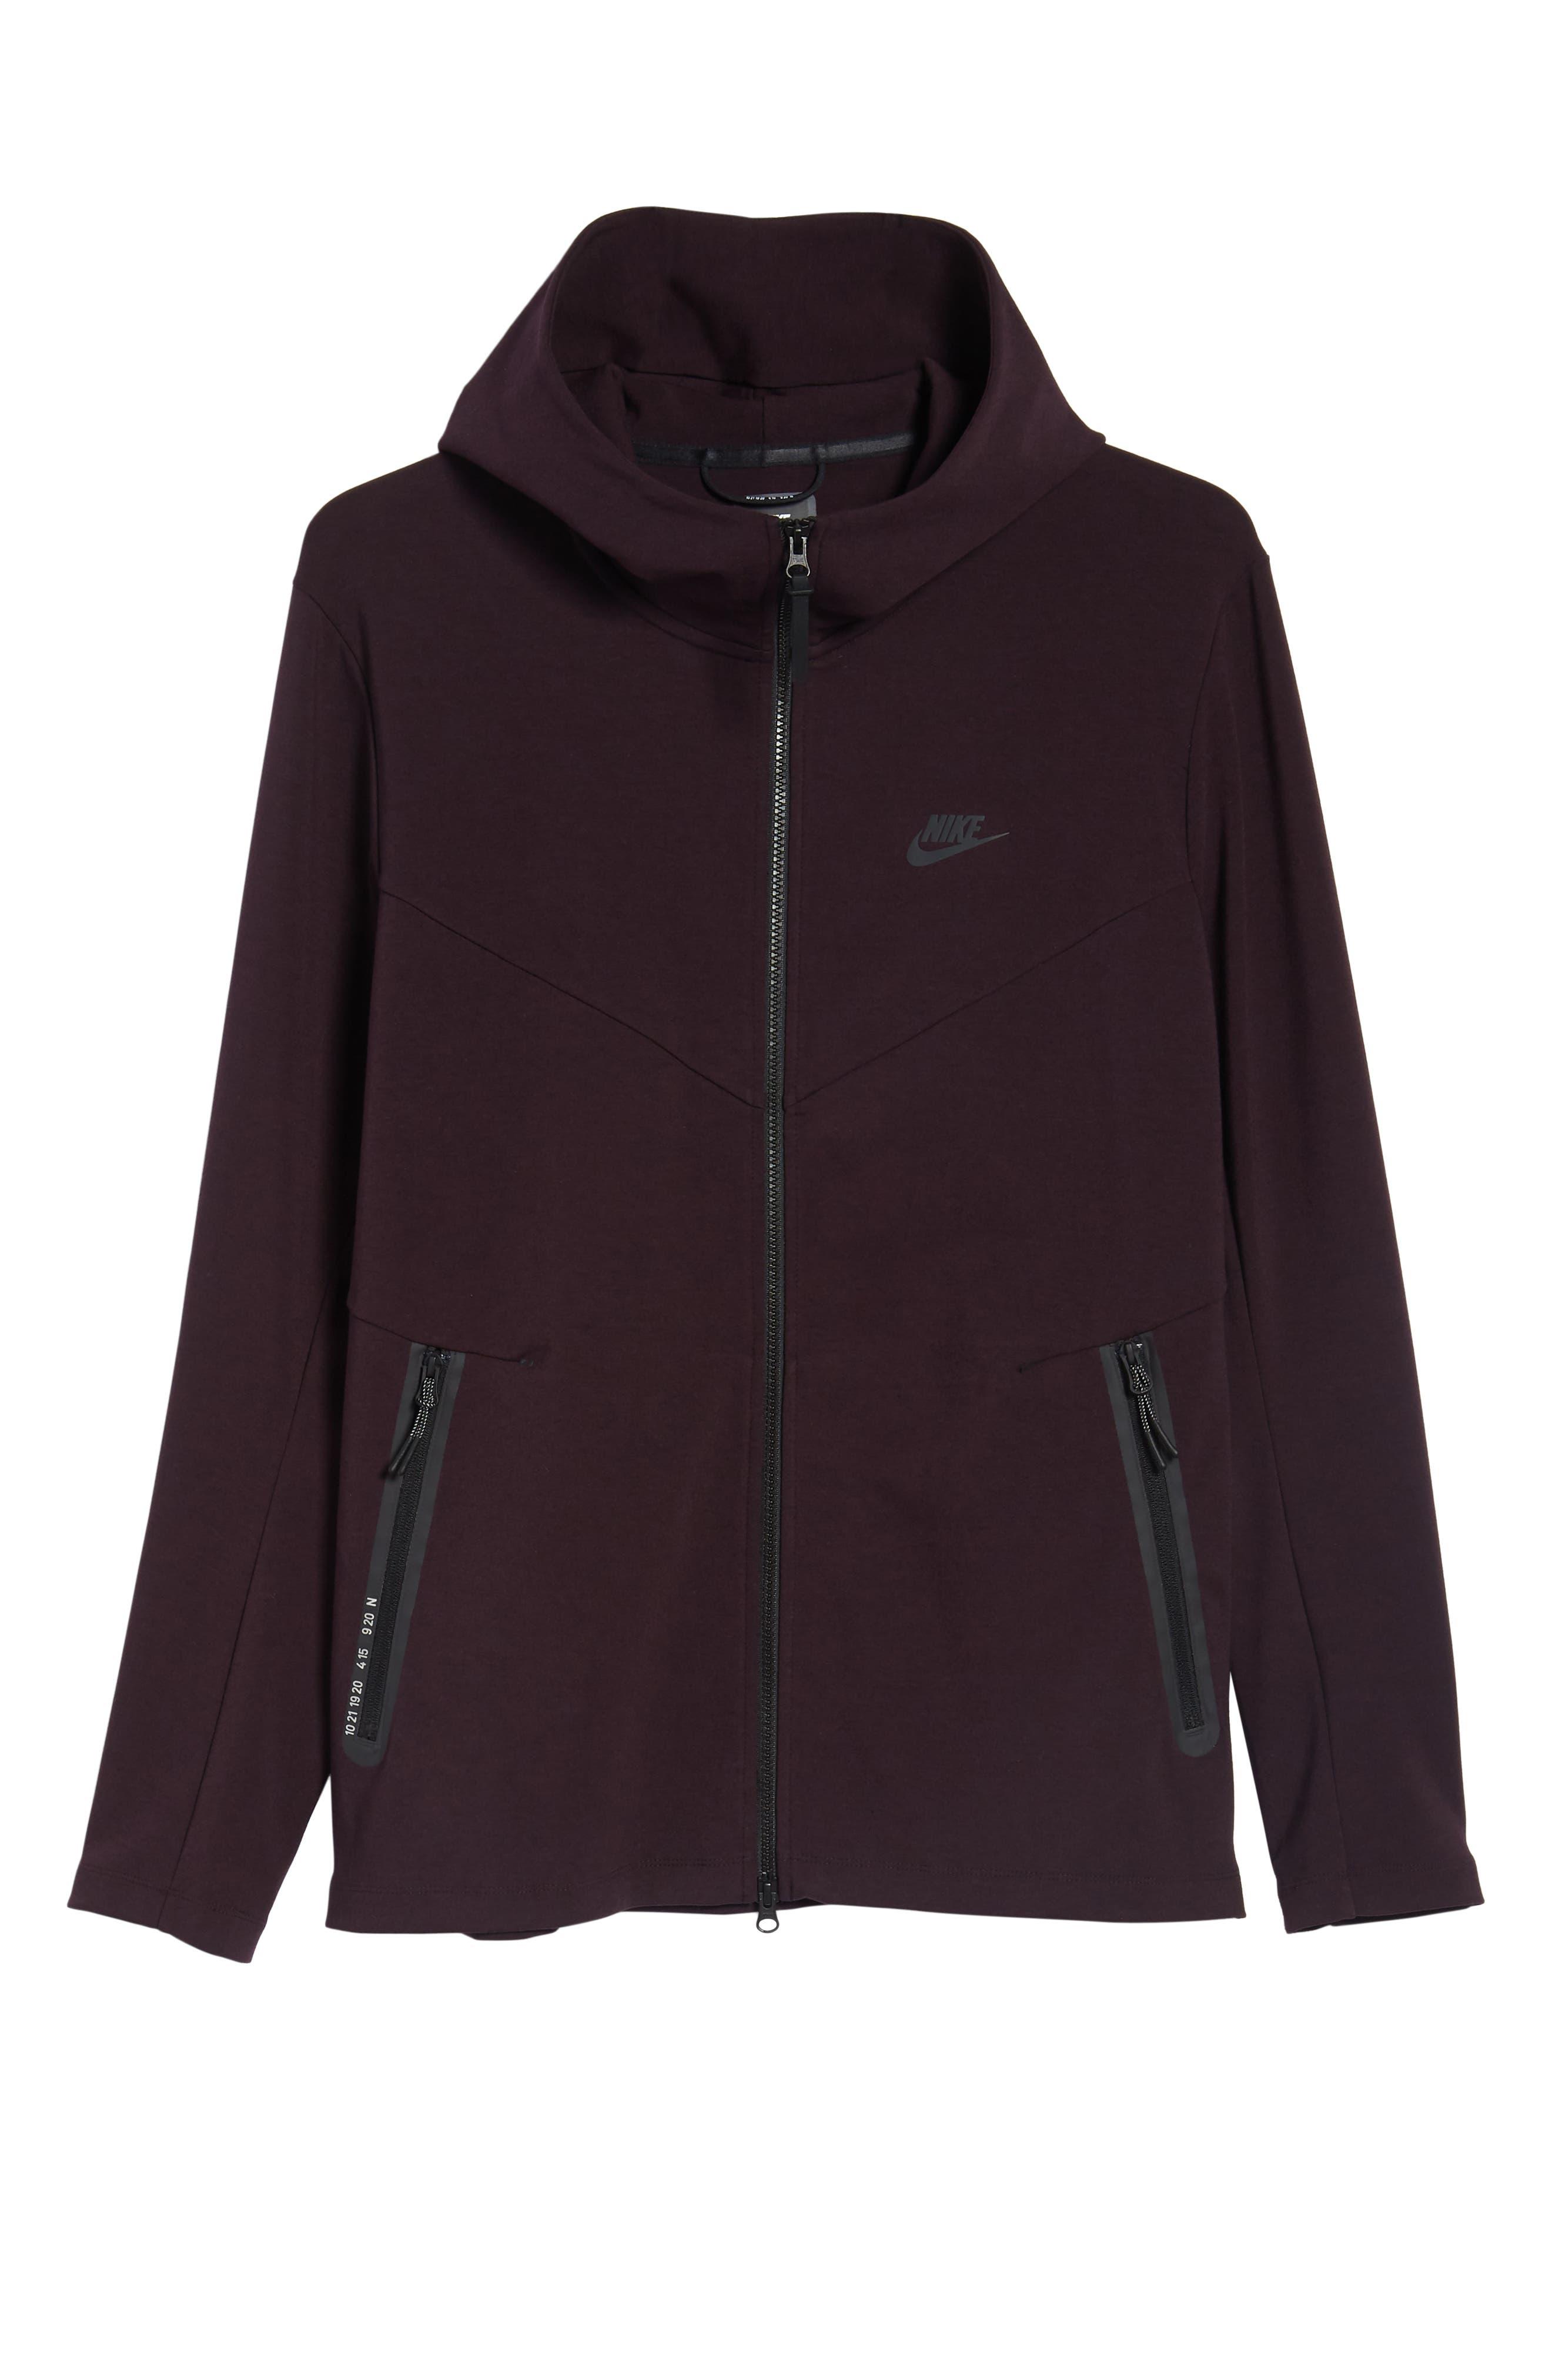 NIKE,                             Sportswear Tech Full Zip Hoodie,                             Alternate thumbnail 6, color,                             010